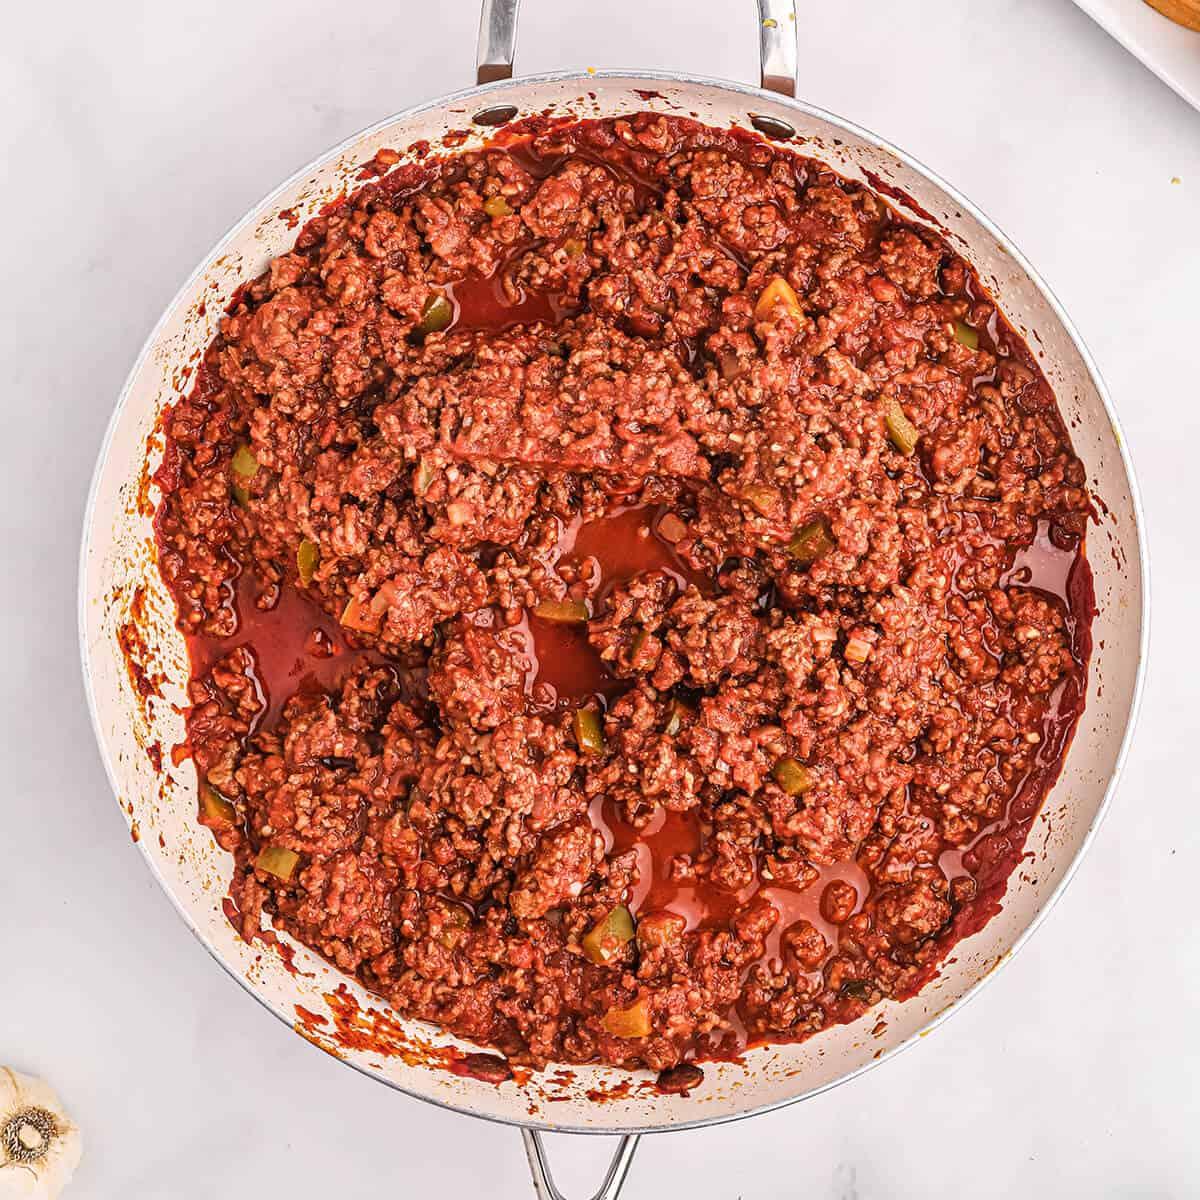 Beef mixture after cooking.